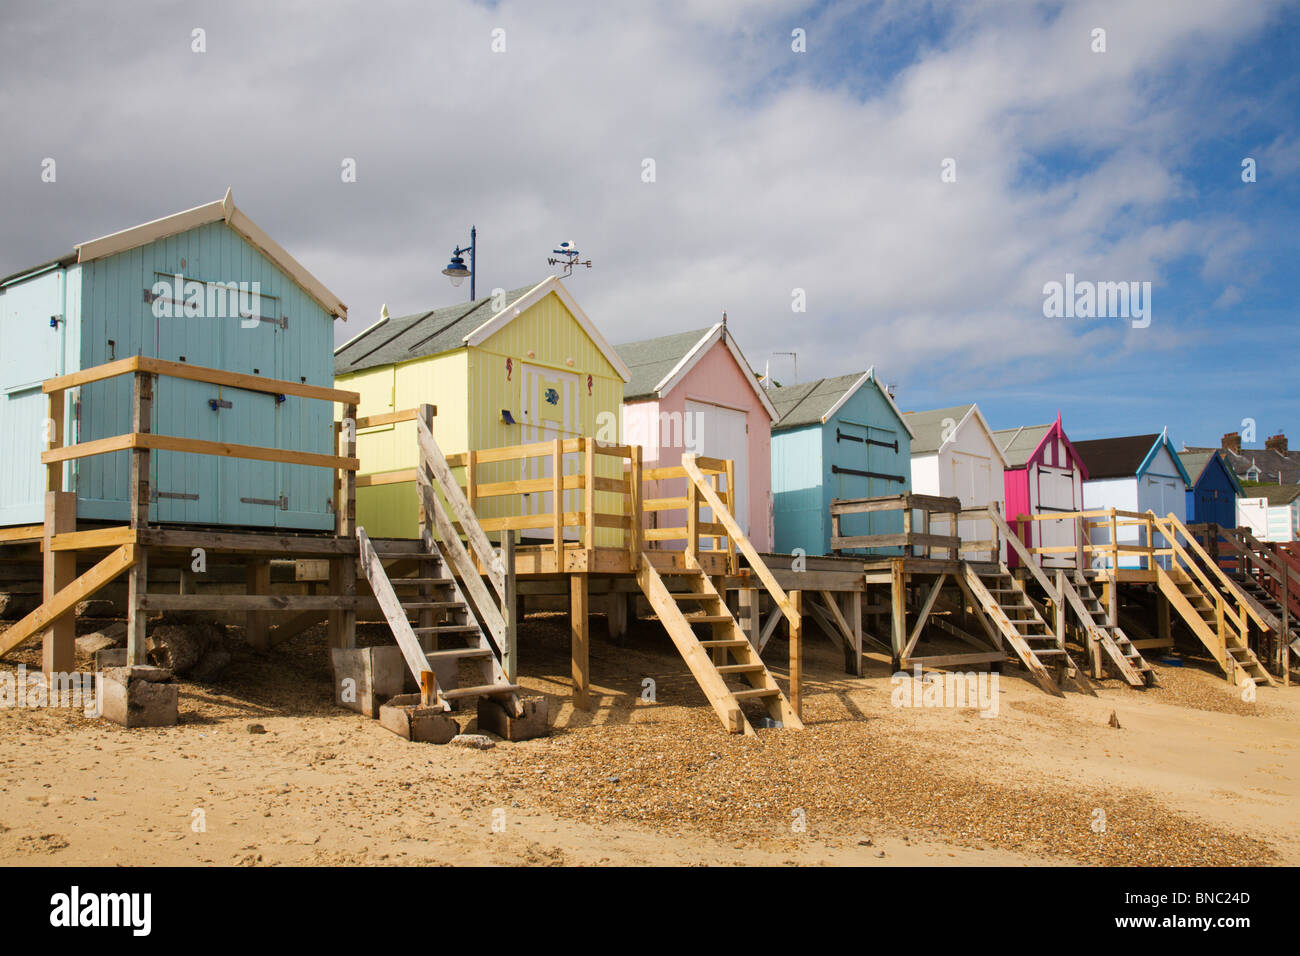 Pretty, traditional beach huts on Felixstowe beach in Suffolk, England. - Stock Image